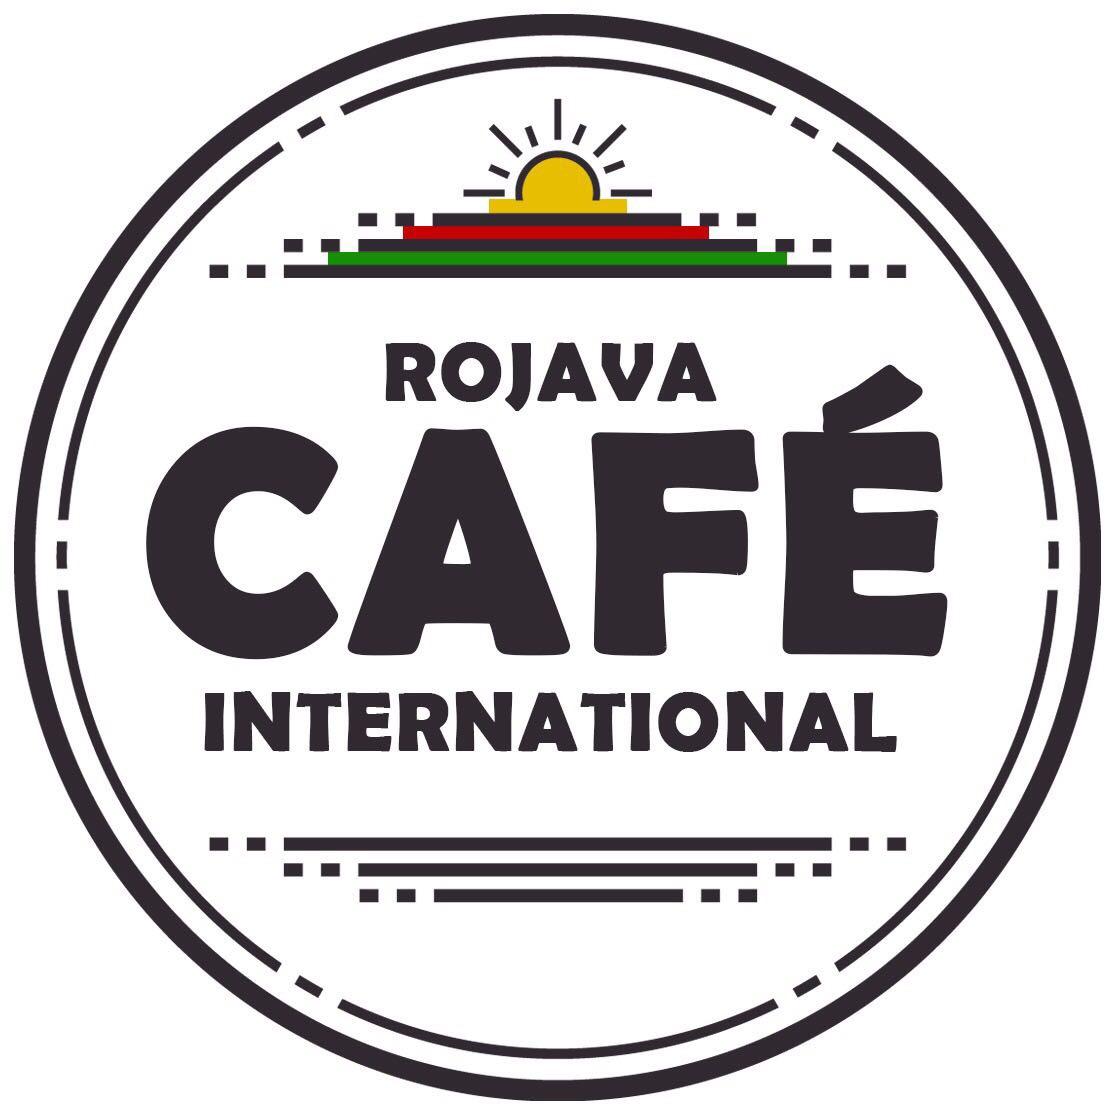 Café Rojava - international (Hannover)